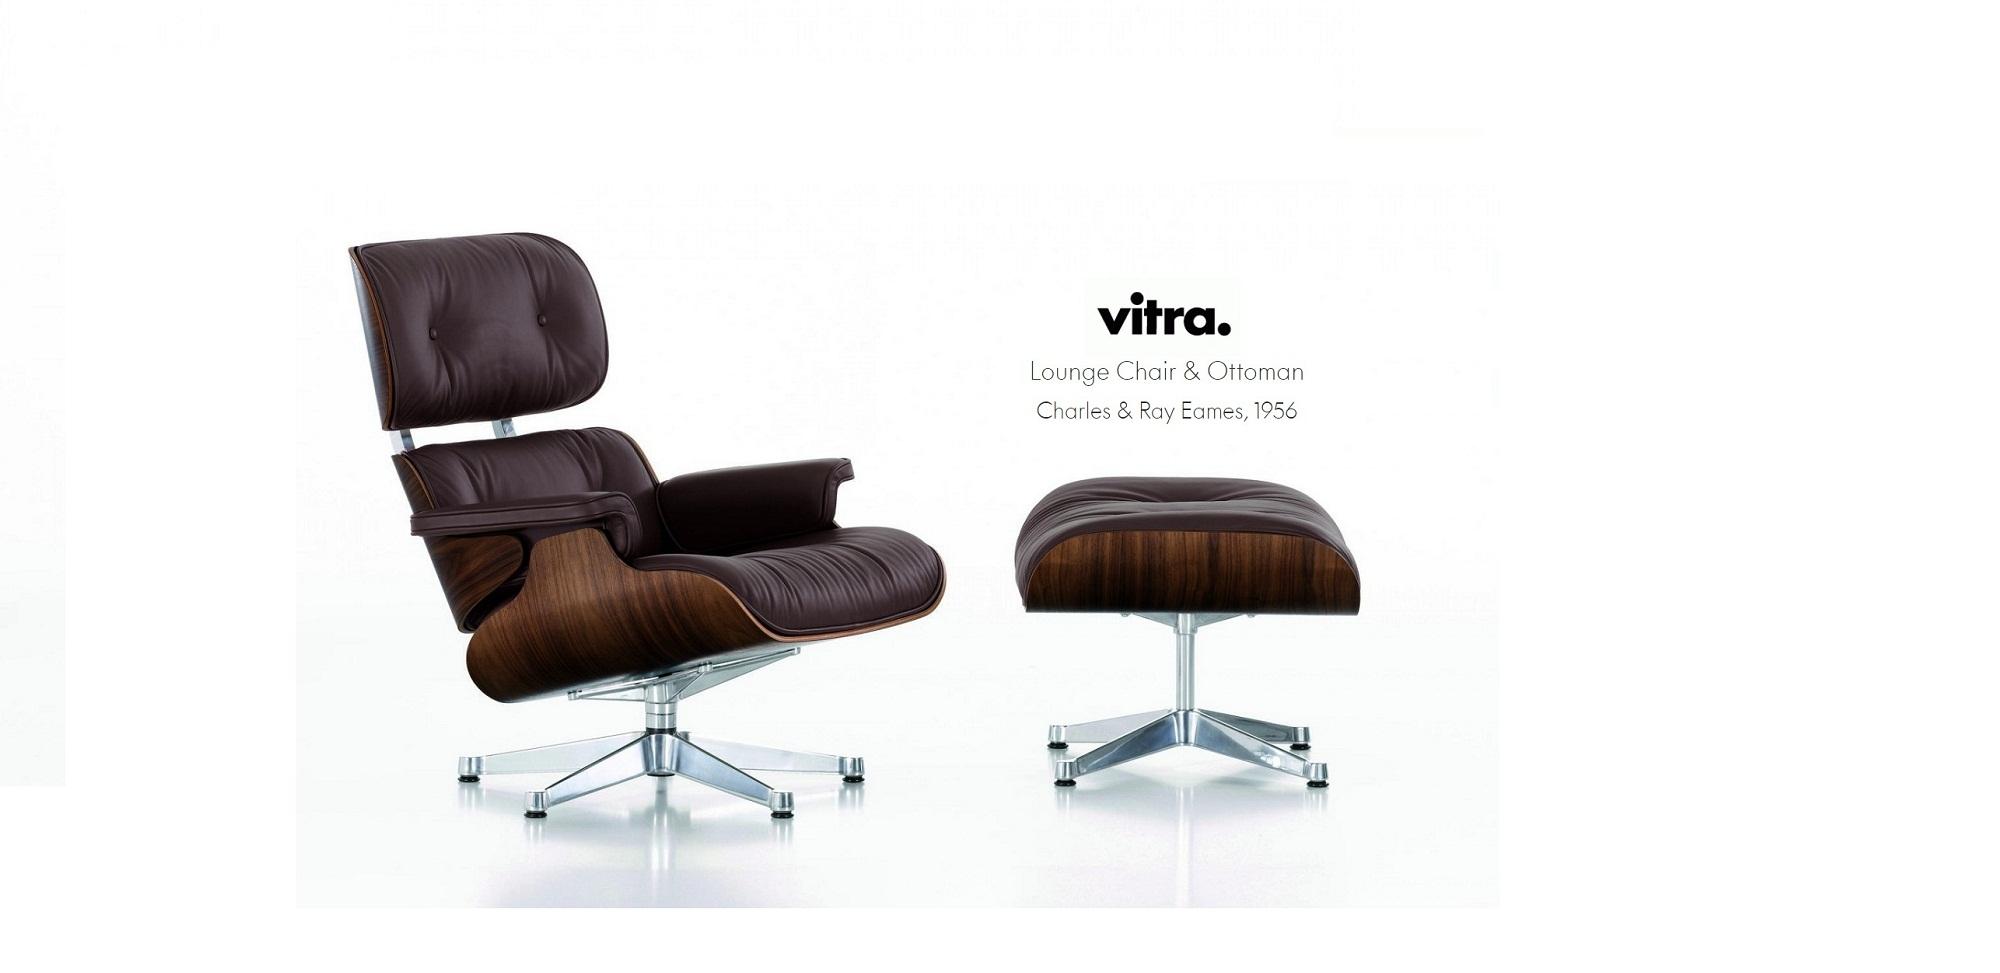 vitra_charles_eames_lounge_chair_nussbaum_16_leder_premium_chocolate